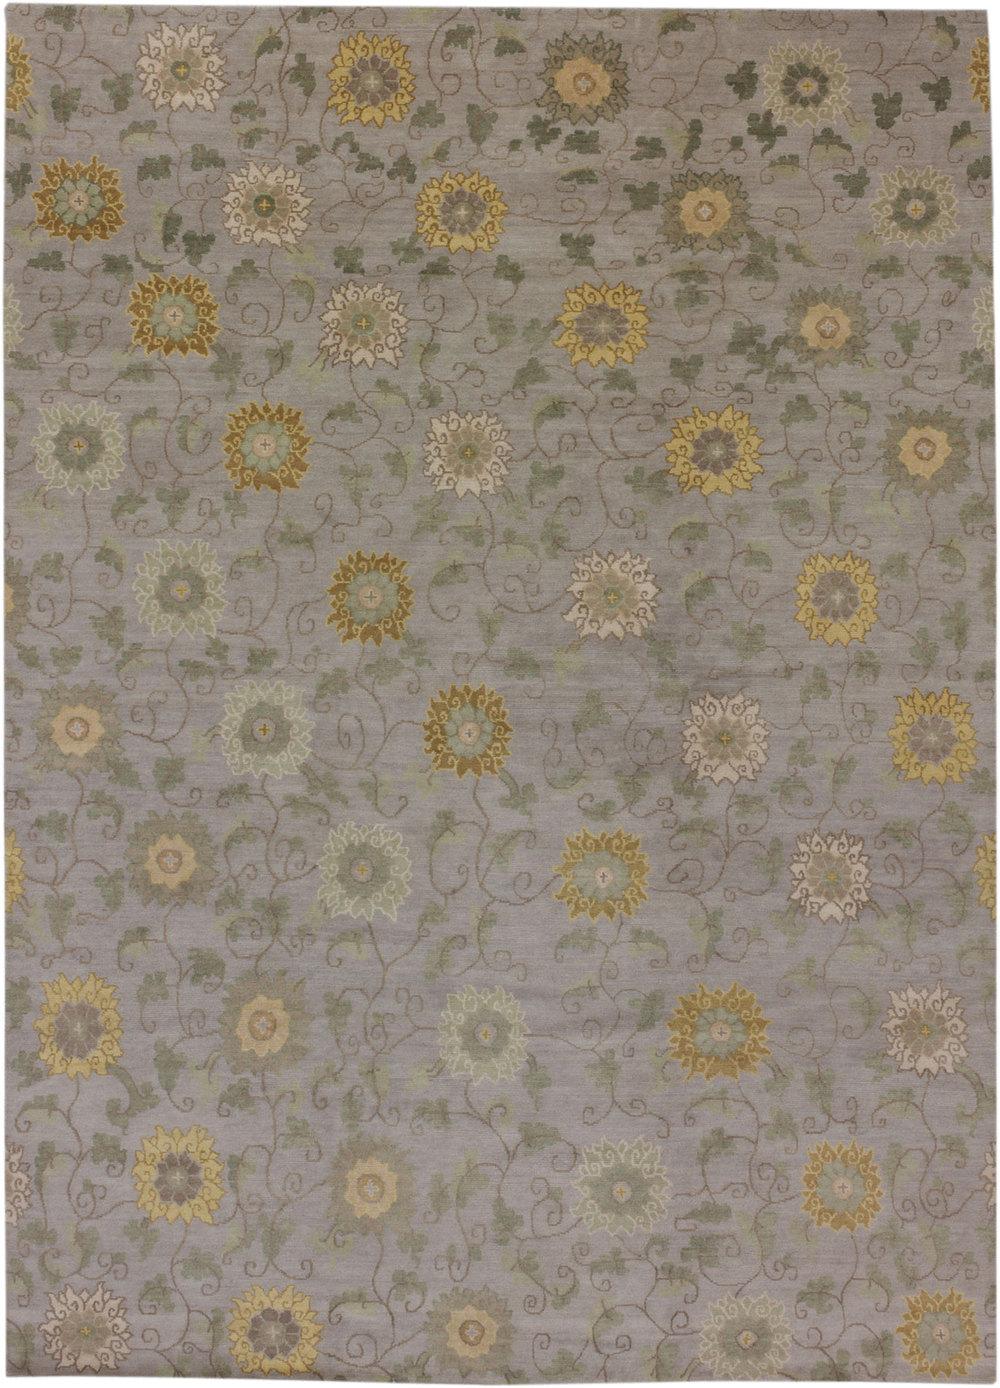 Big-Chrysanthemum_Neutral_t1.jpg